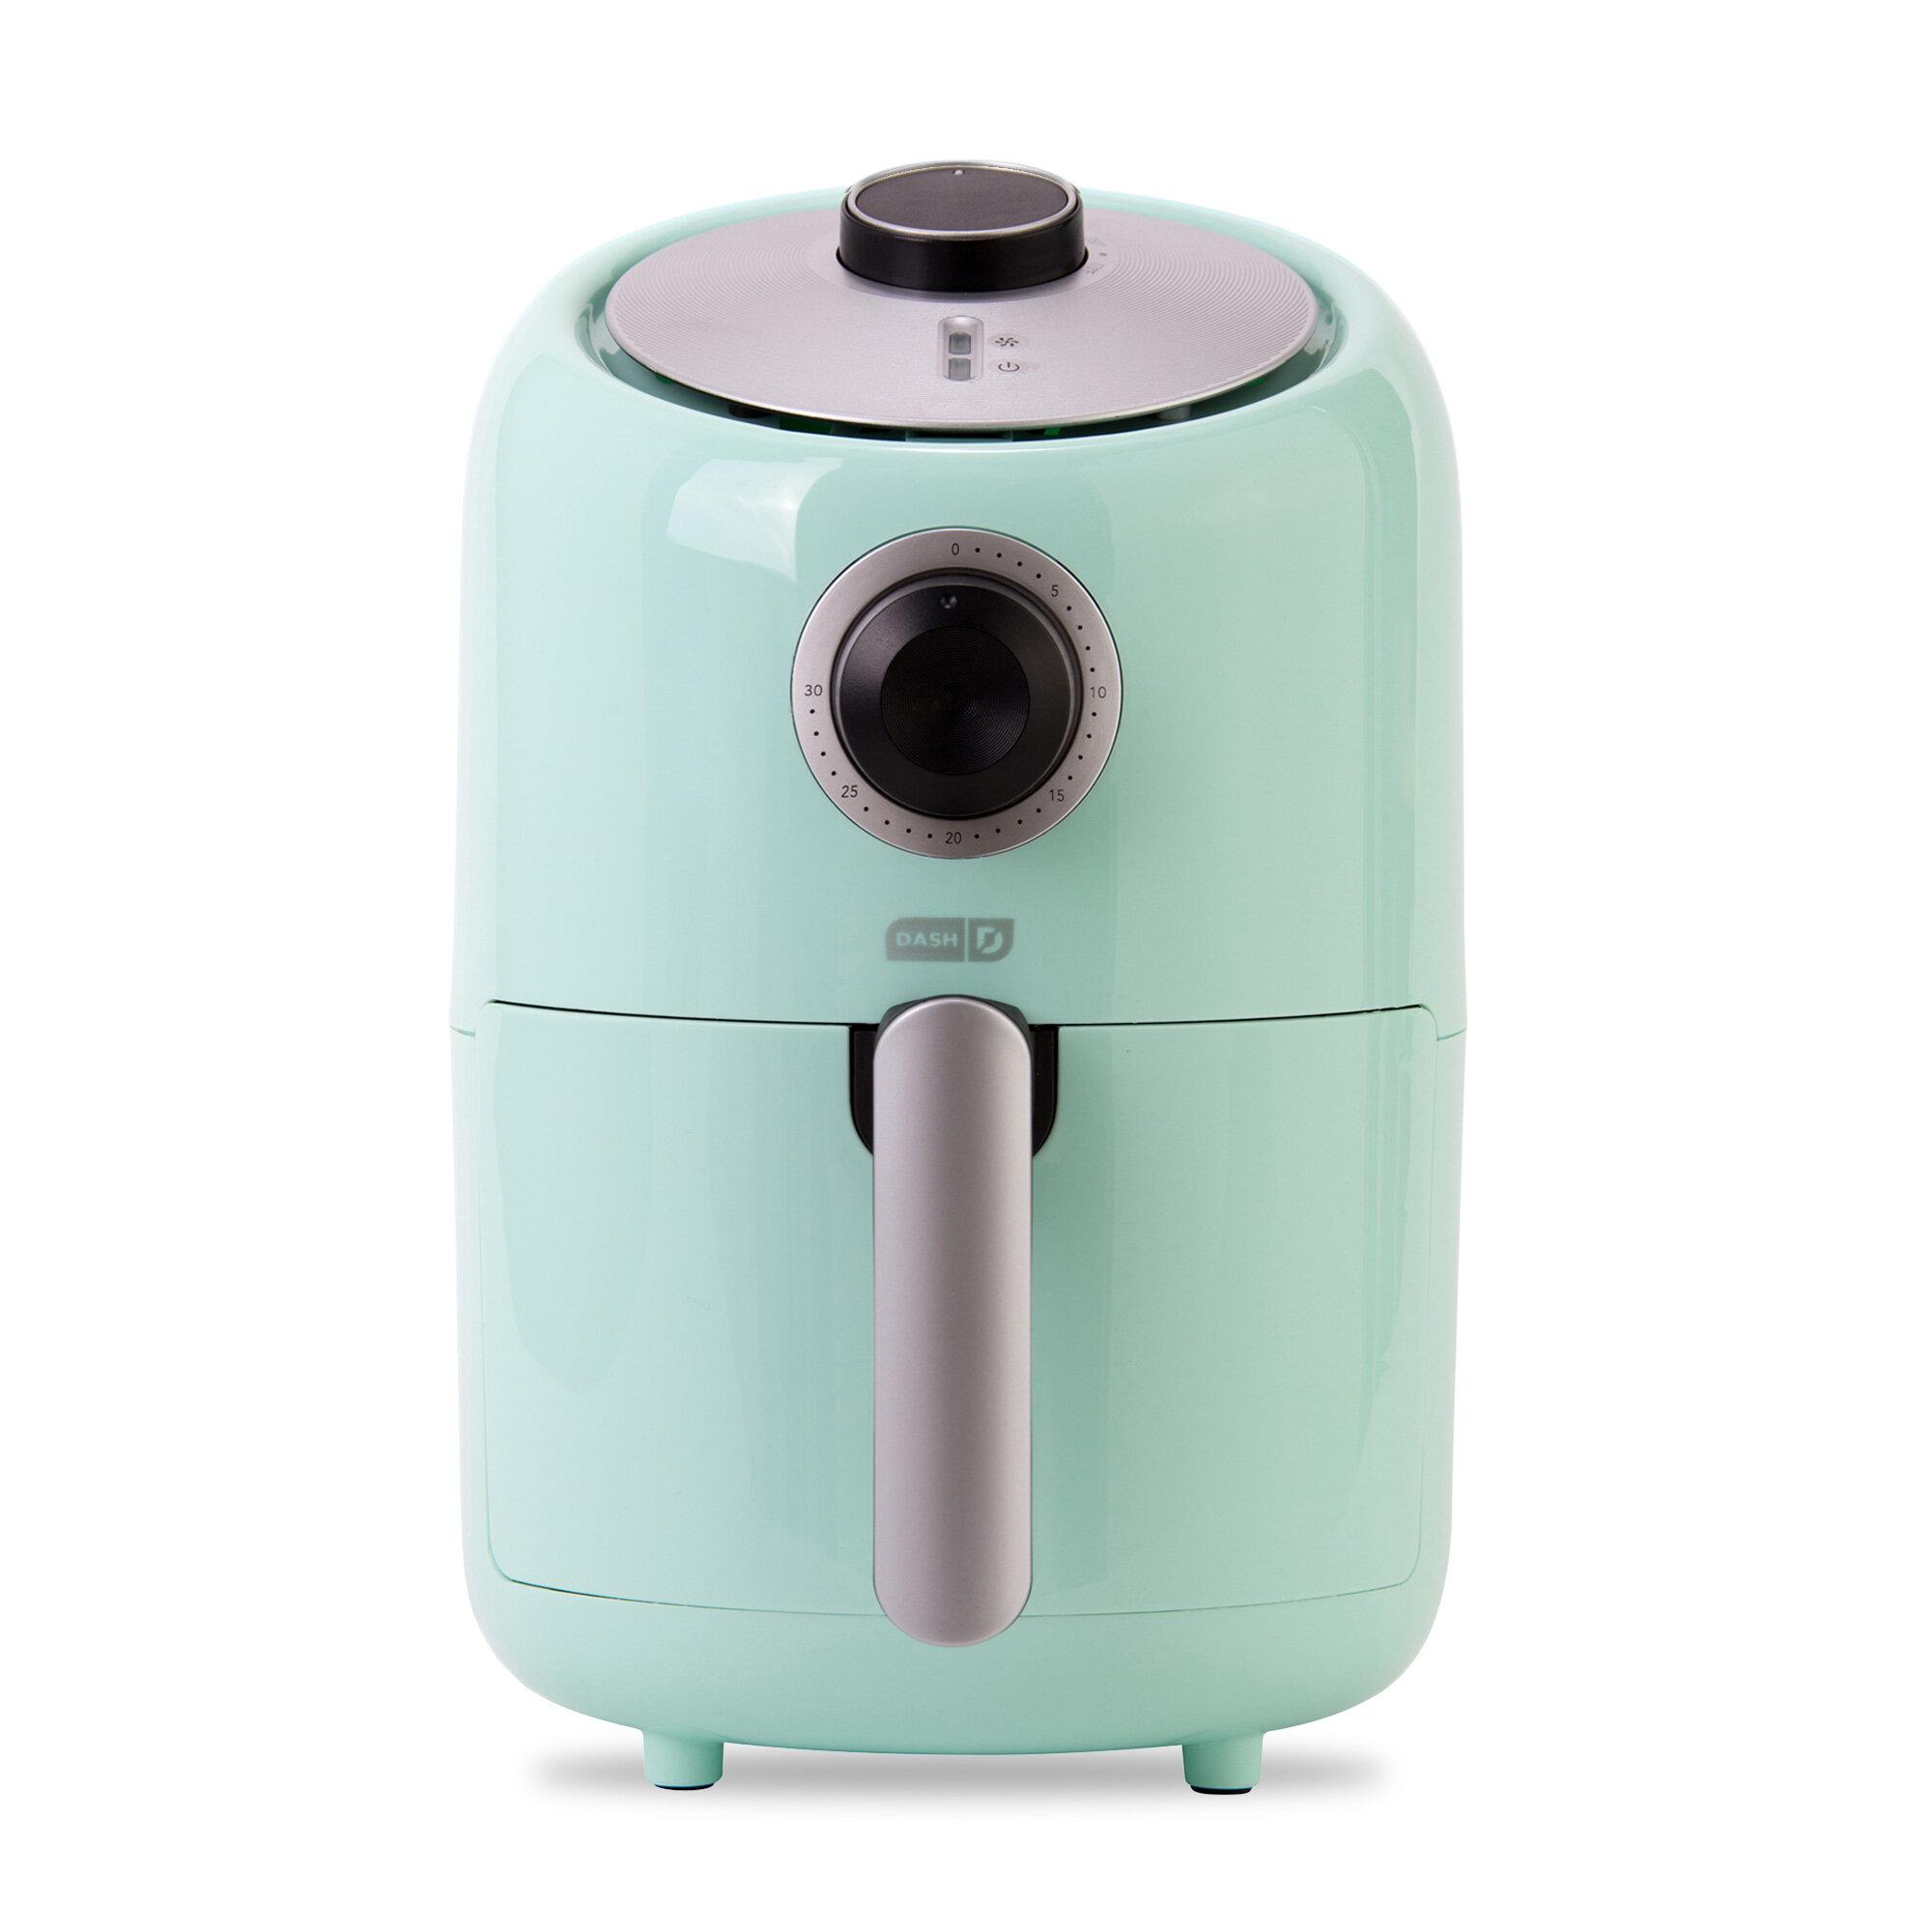 DASH 1.2 Liter Compact Air Fryer & Reviews | Wayfair